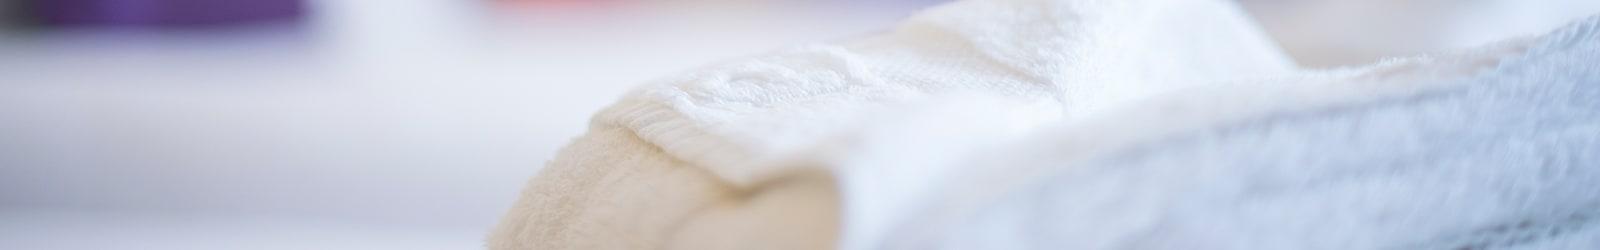 Bedroom Towels On Bed Banner 1